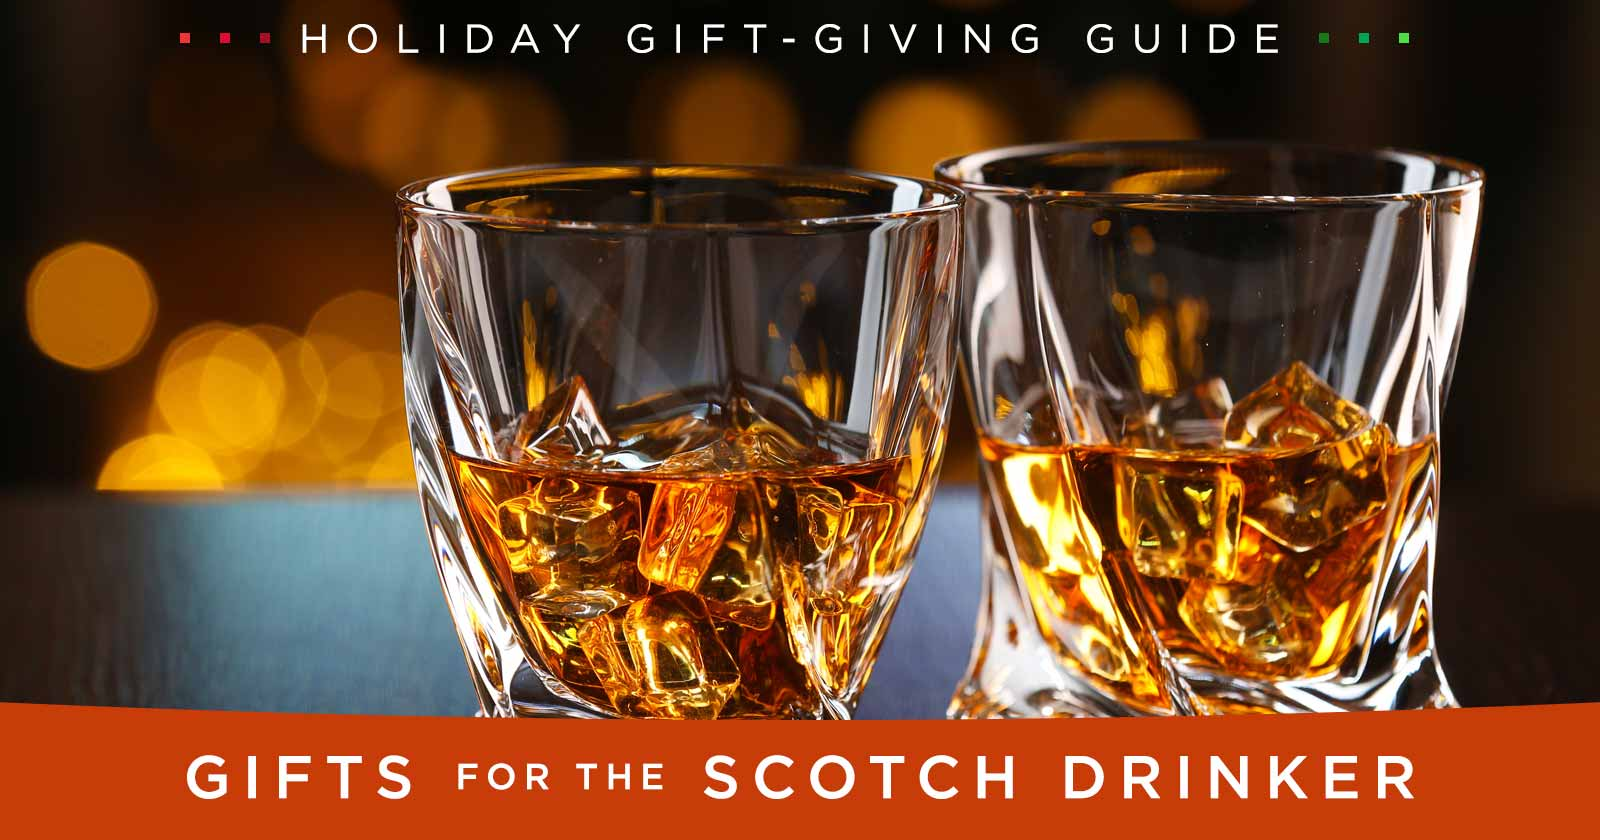 Gifts for the Single-Malt Scotch Drinker